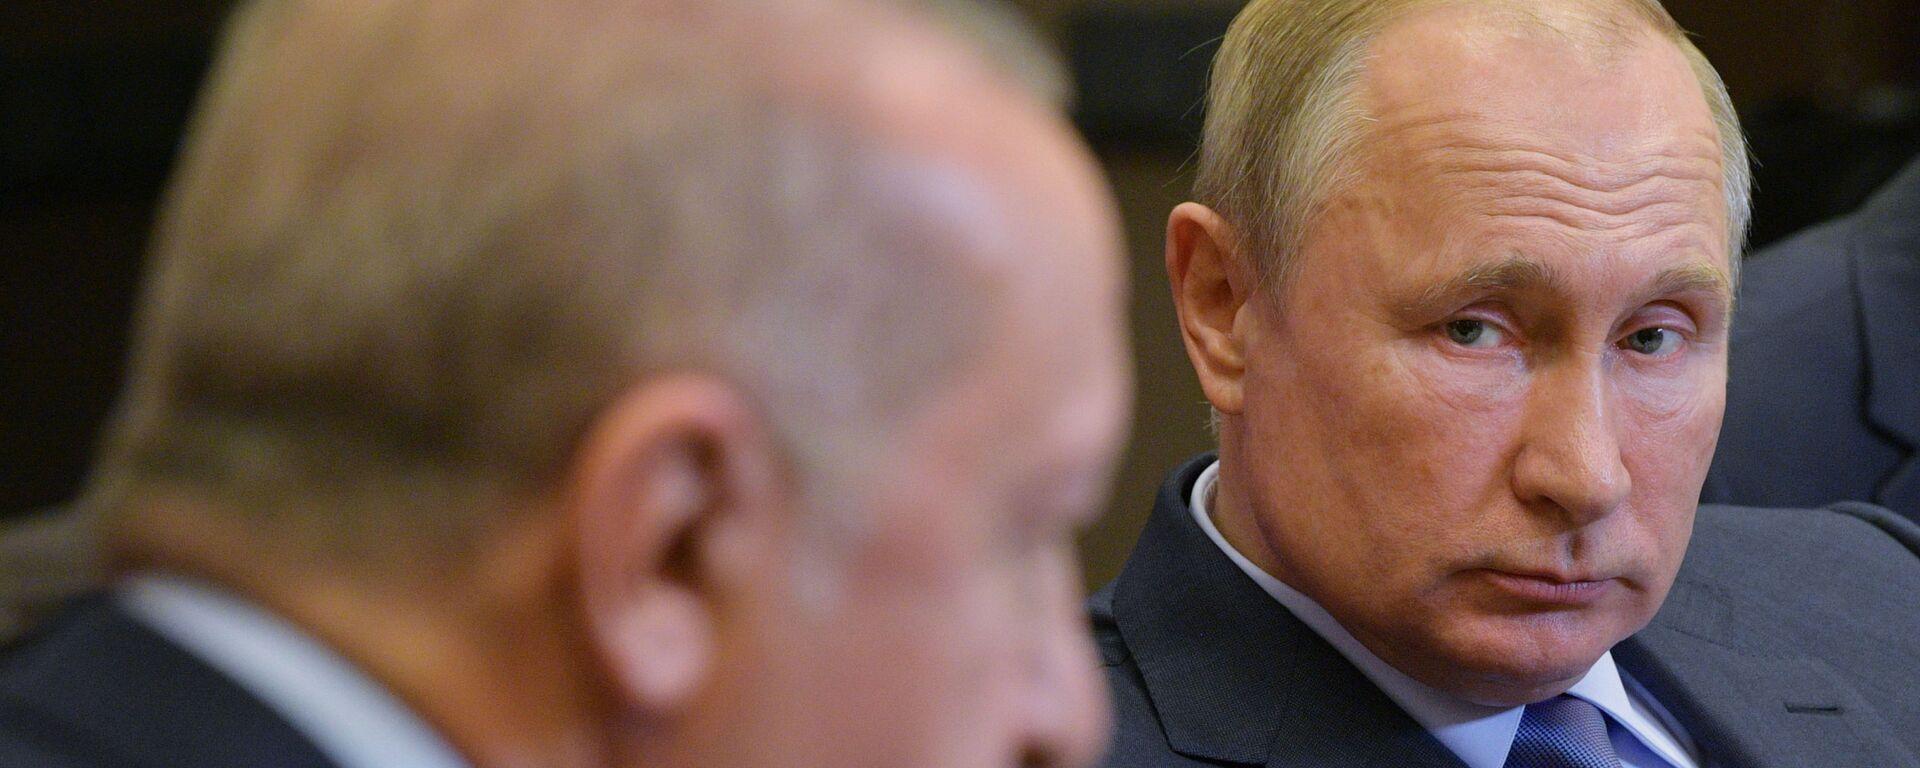 Russian President Vladimir Putin listens to his Turkish counterpart Recep Tayyip Erdogan during their meeting in the Black Sea resort of Sochi, Russia - Sputnik Italia, 1920, 19.03.2021